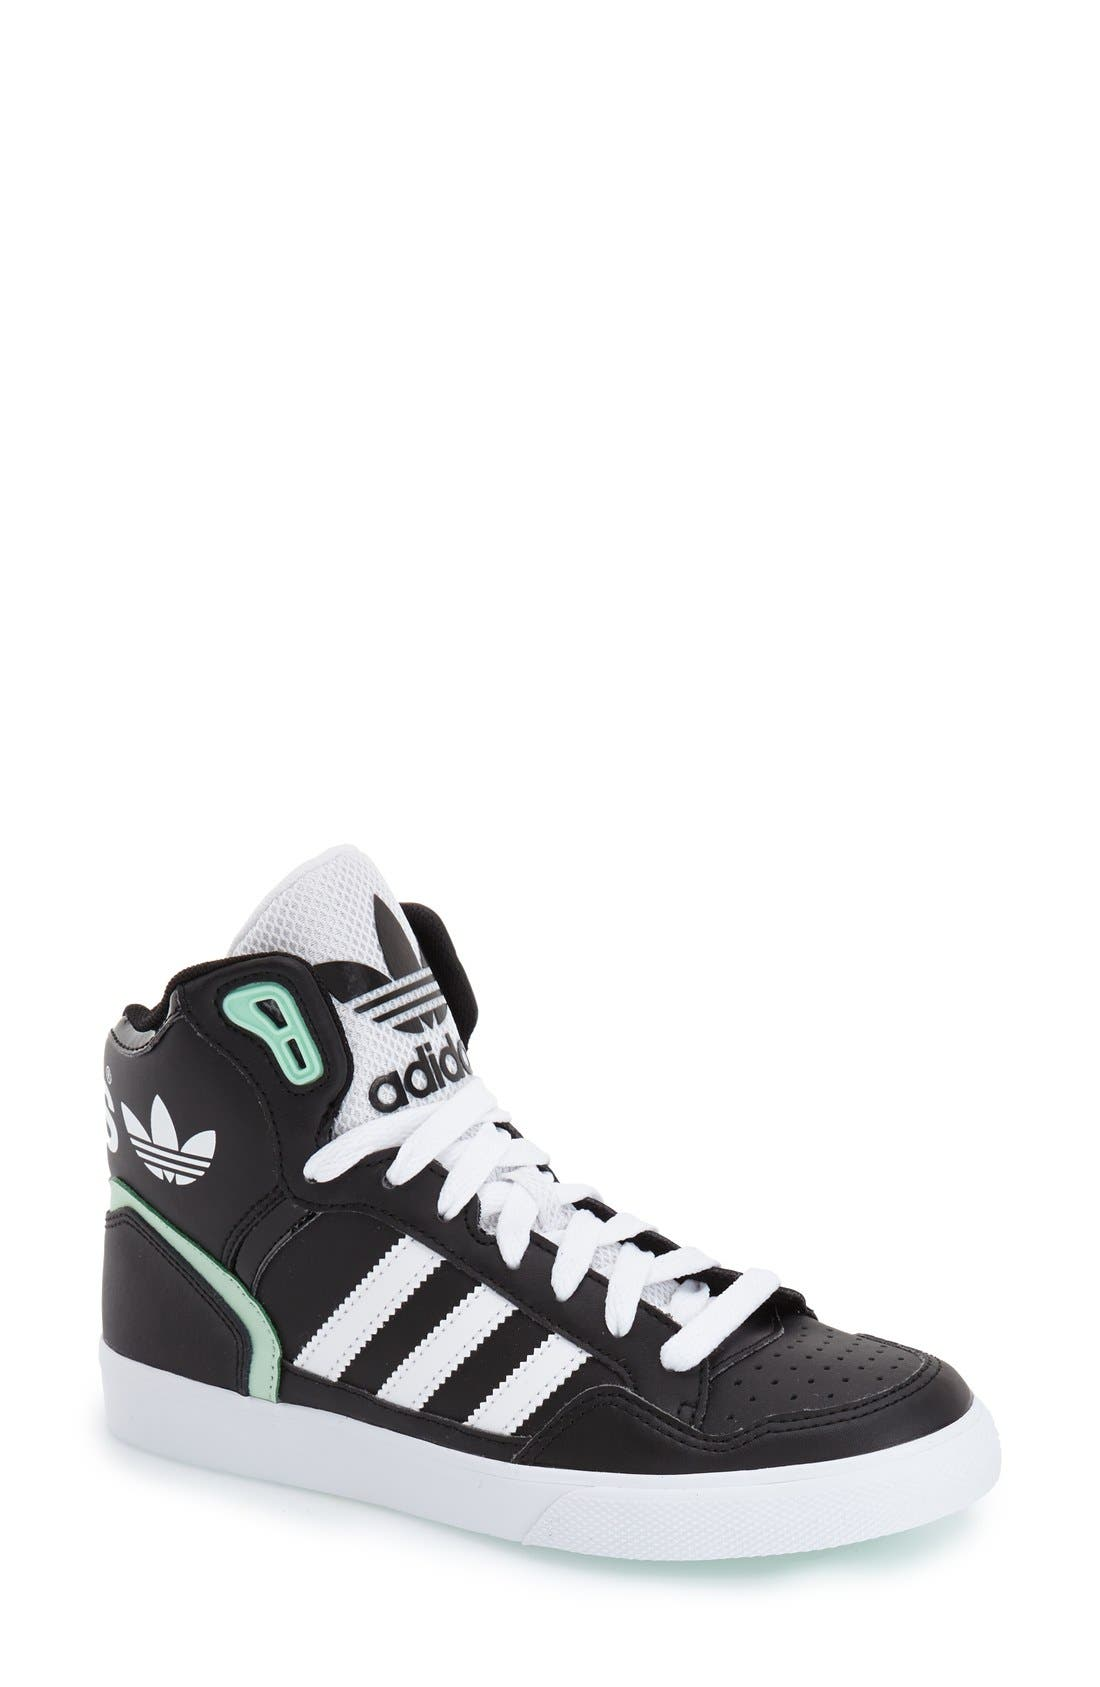 Main Image - adidas 'Extaball' High Top Sneaker (Women)